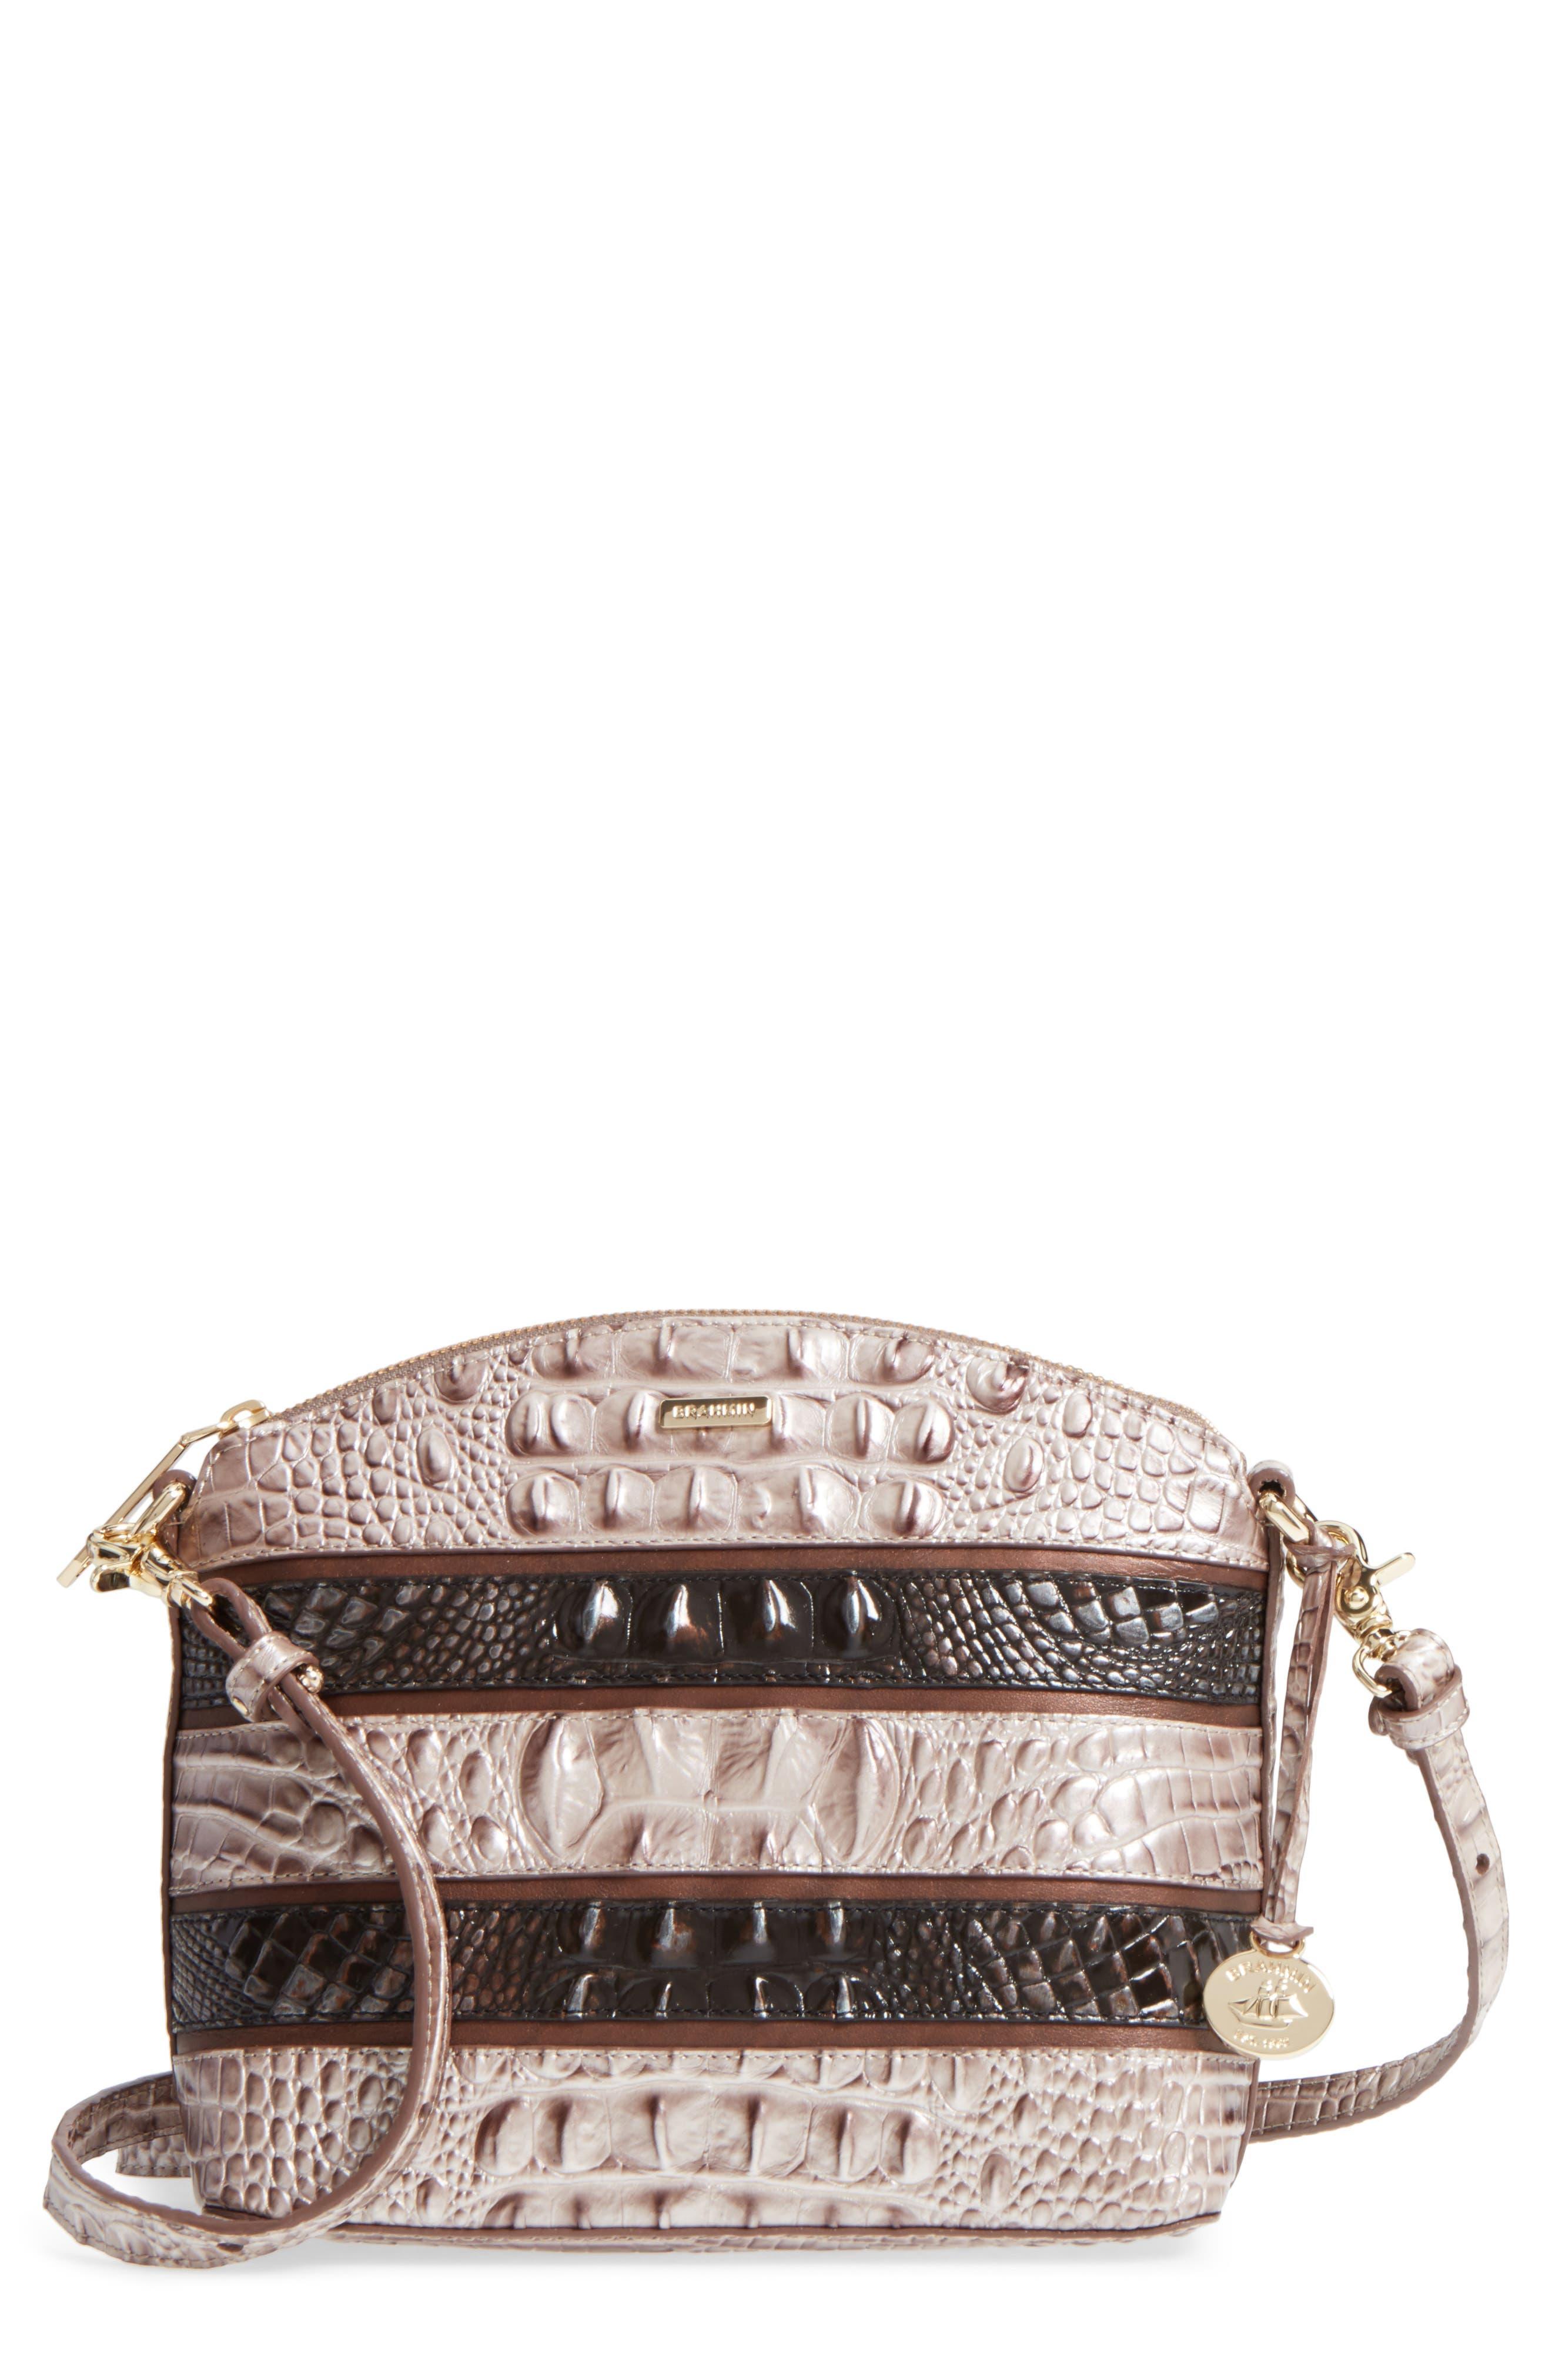 Mini Duxbury Leather Crossbody Bag,                             Main thumbnail 1, color,                             210